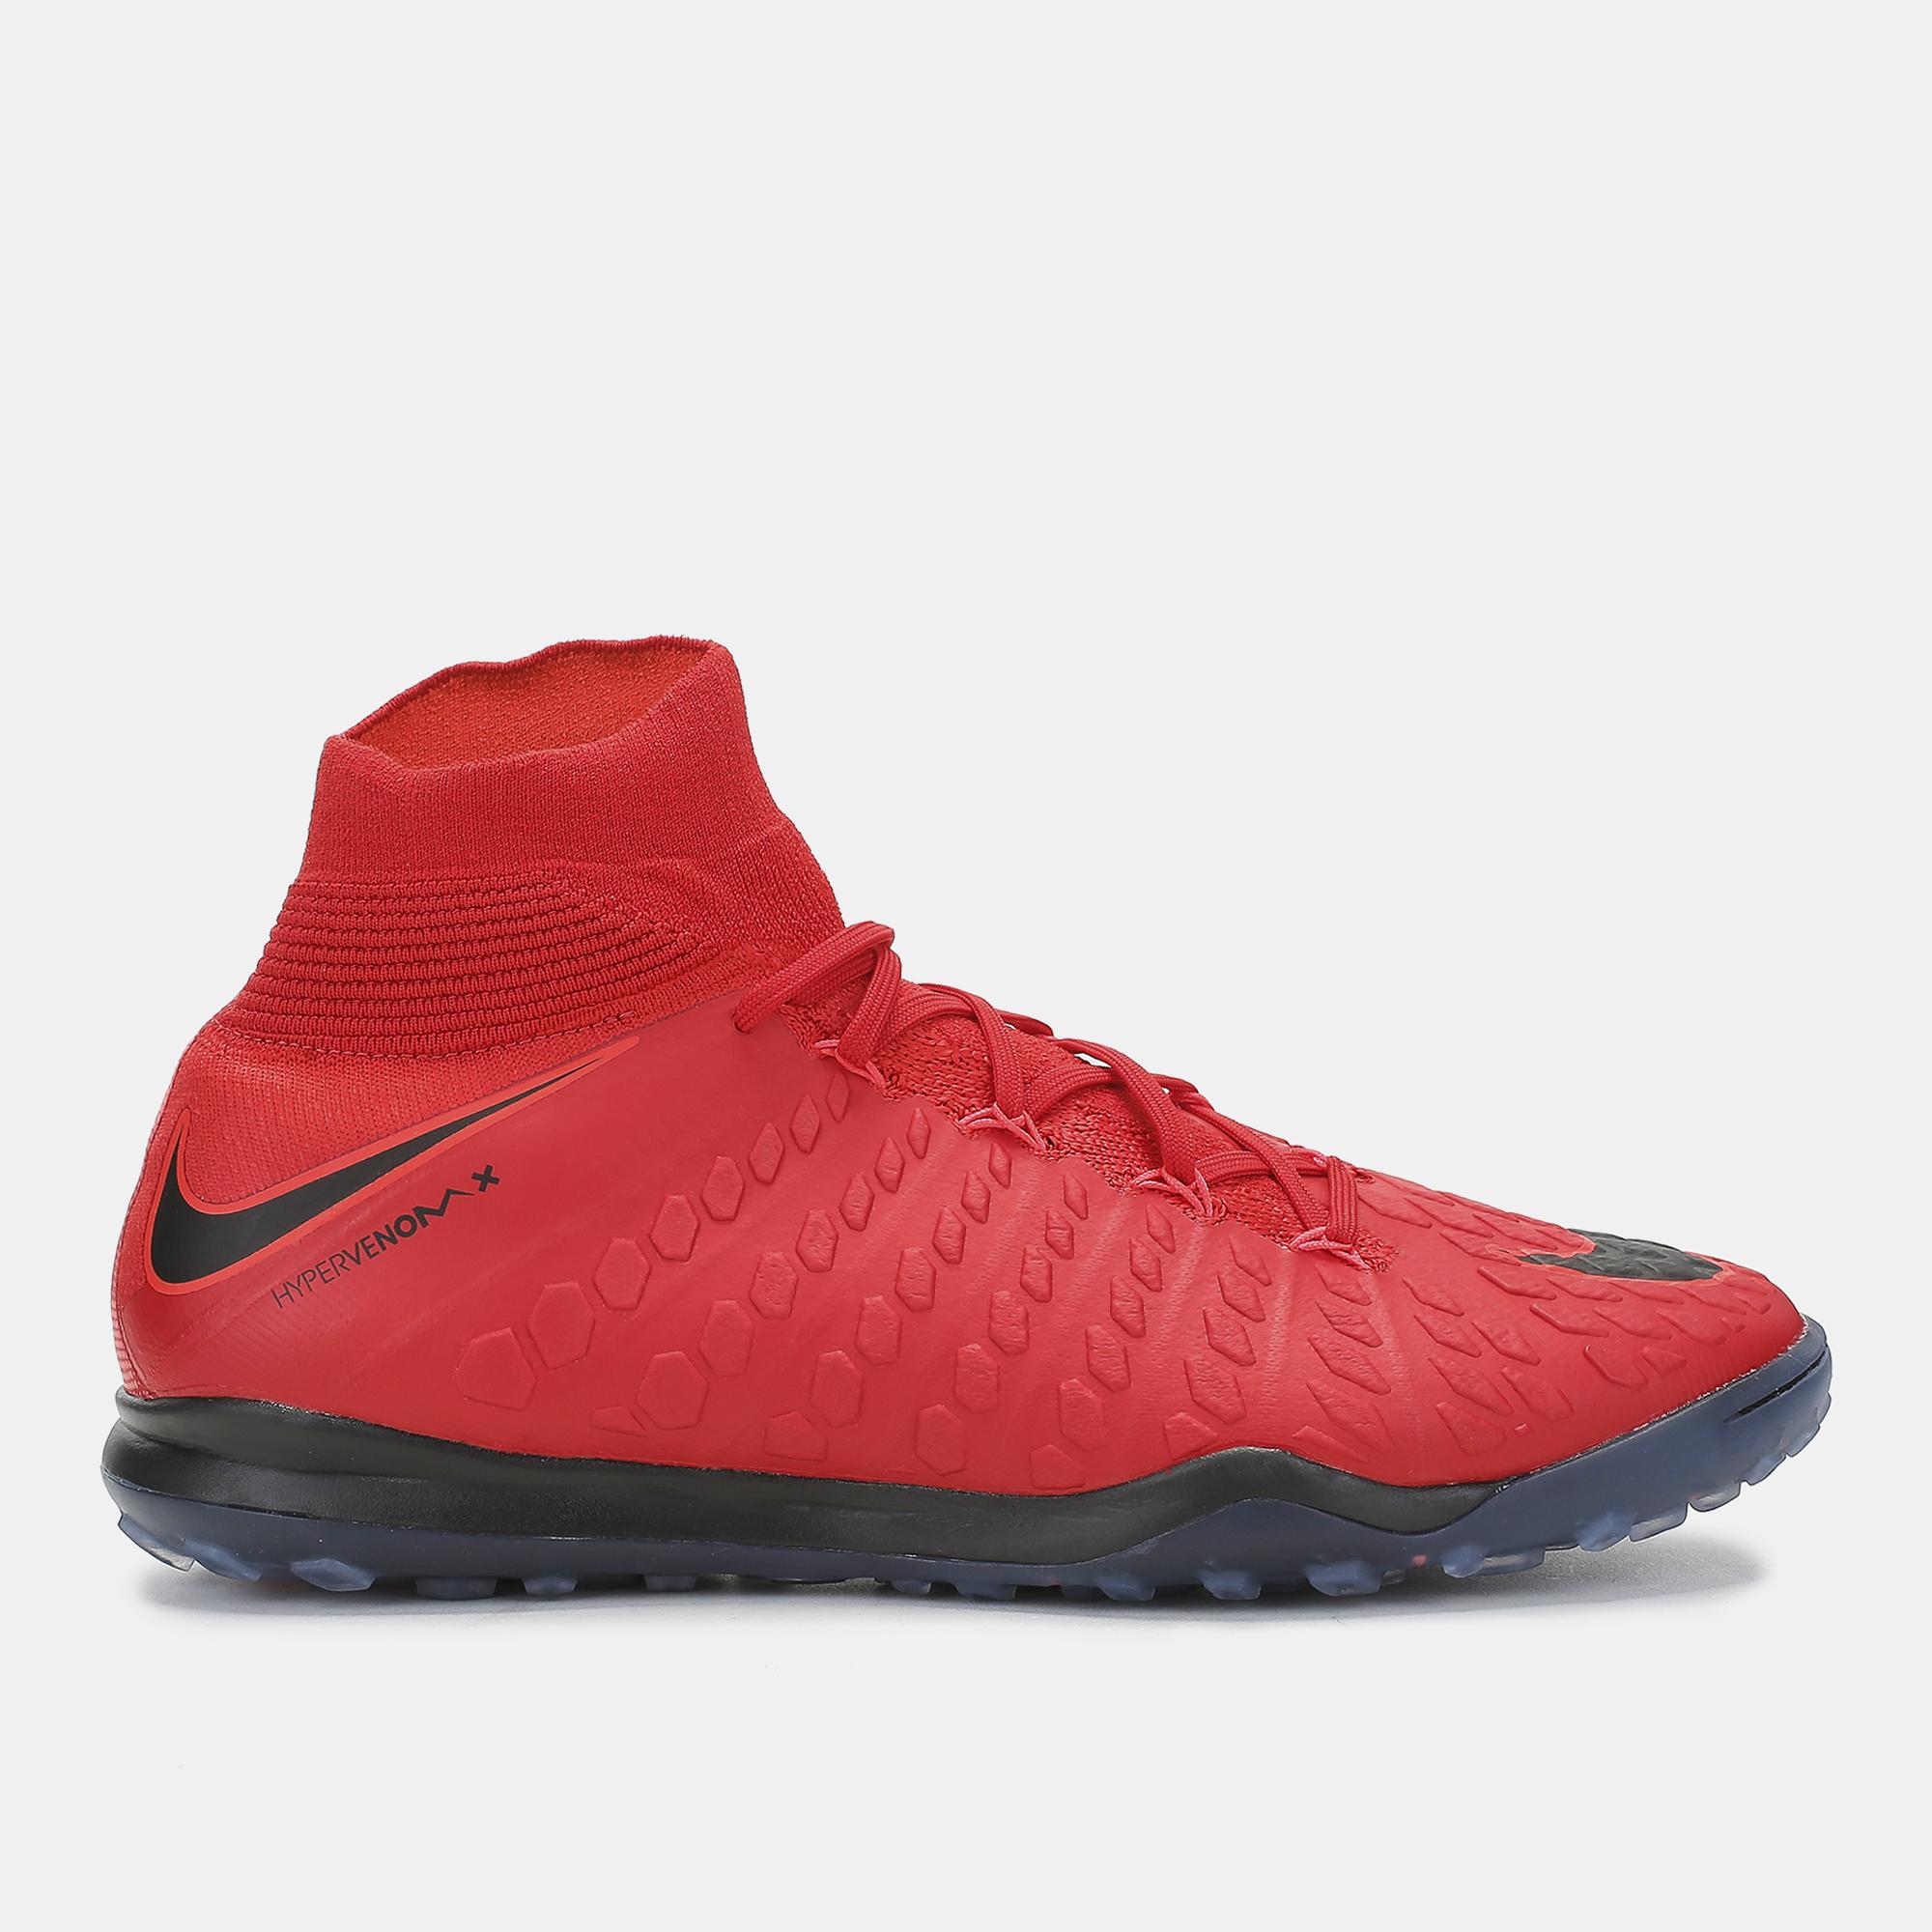 cb17395895e5 Shop Red Nike HypervenomX Proximo II Dynamic Fit Turf Football Shoe ...